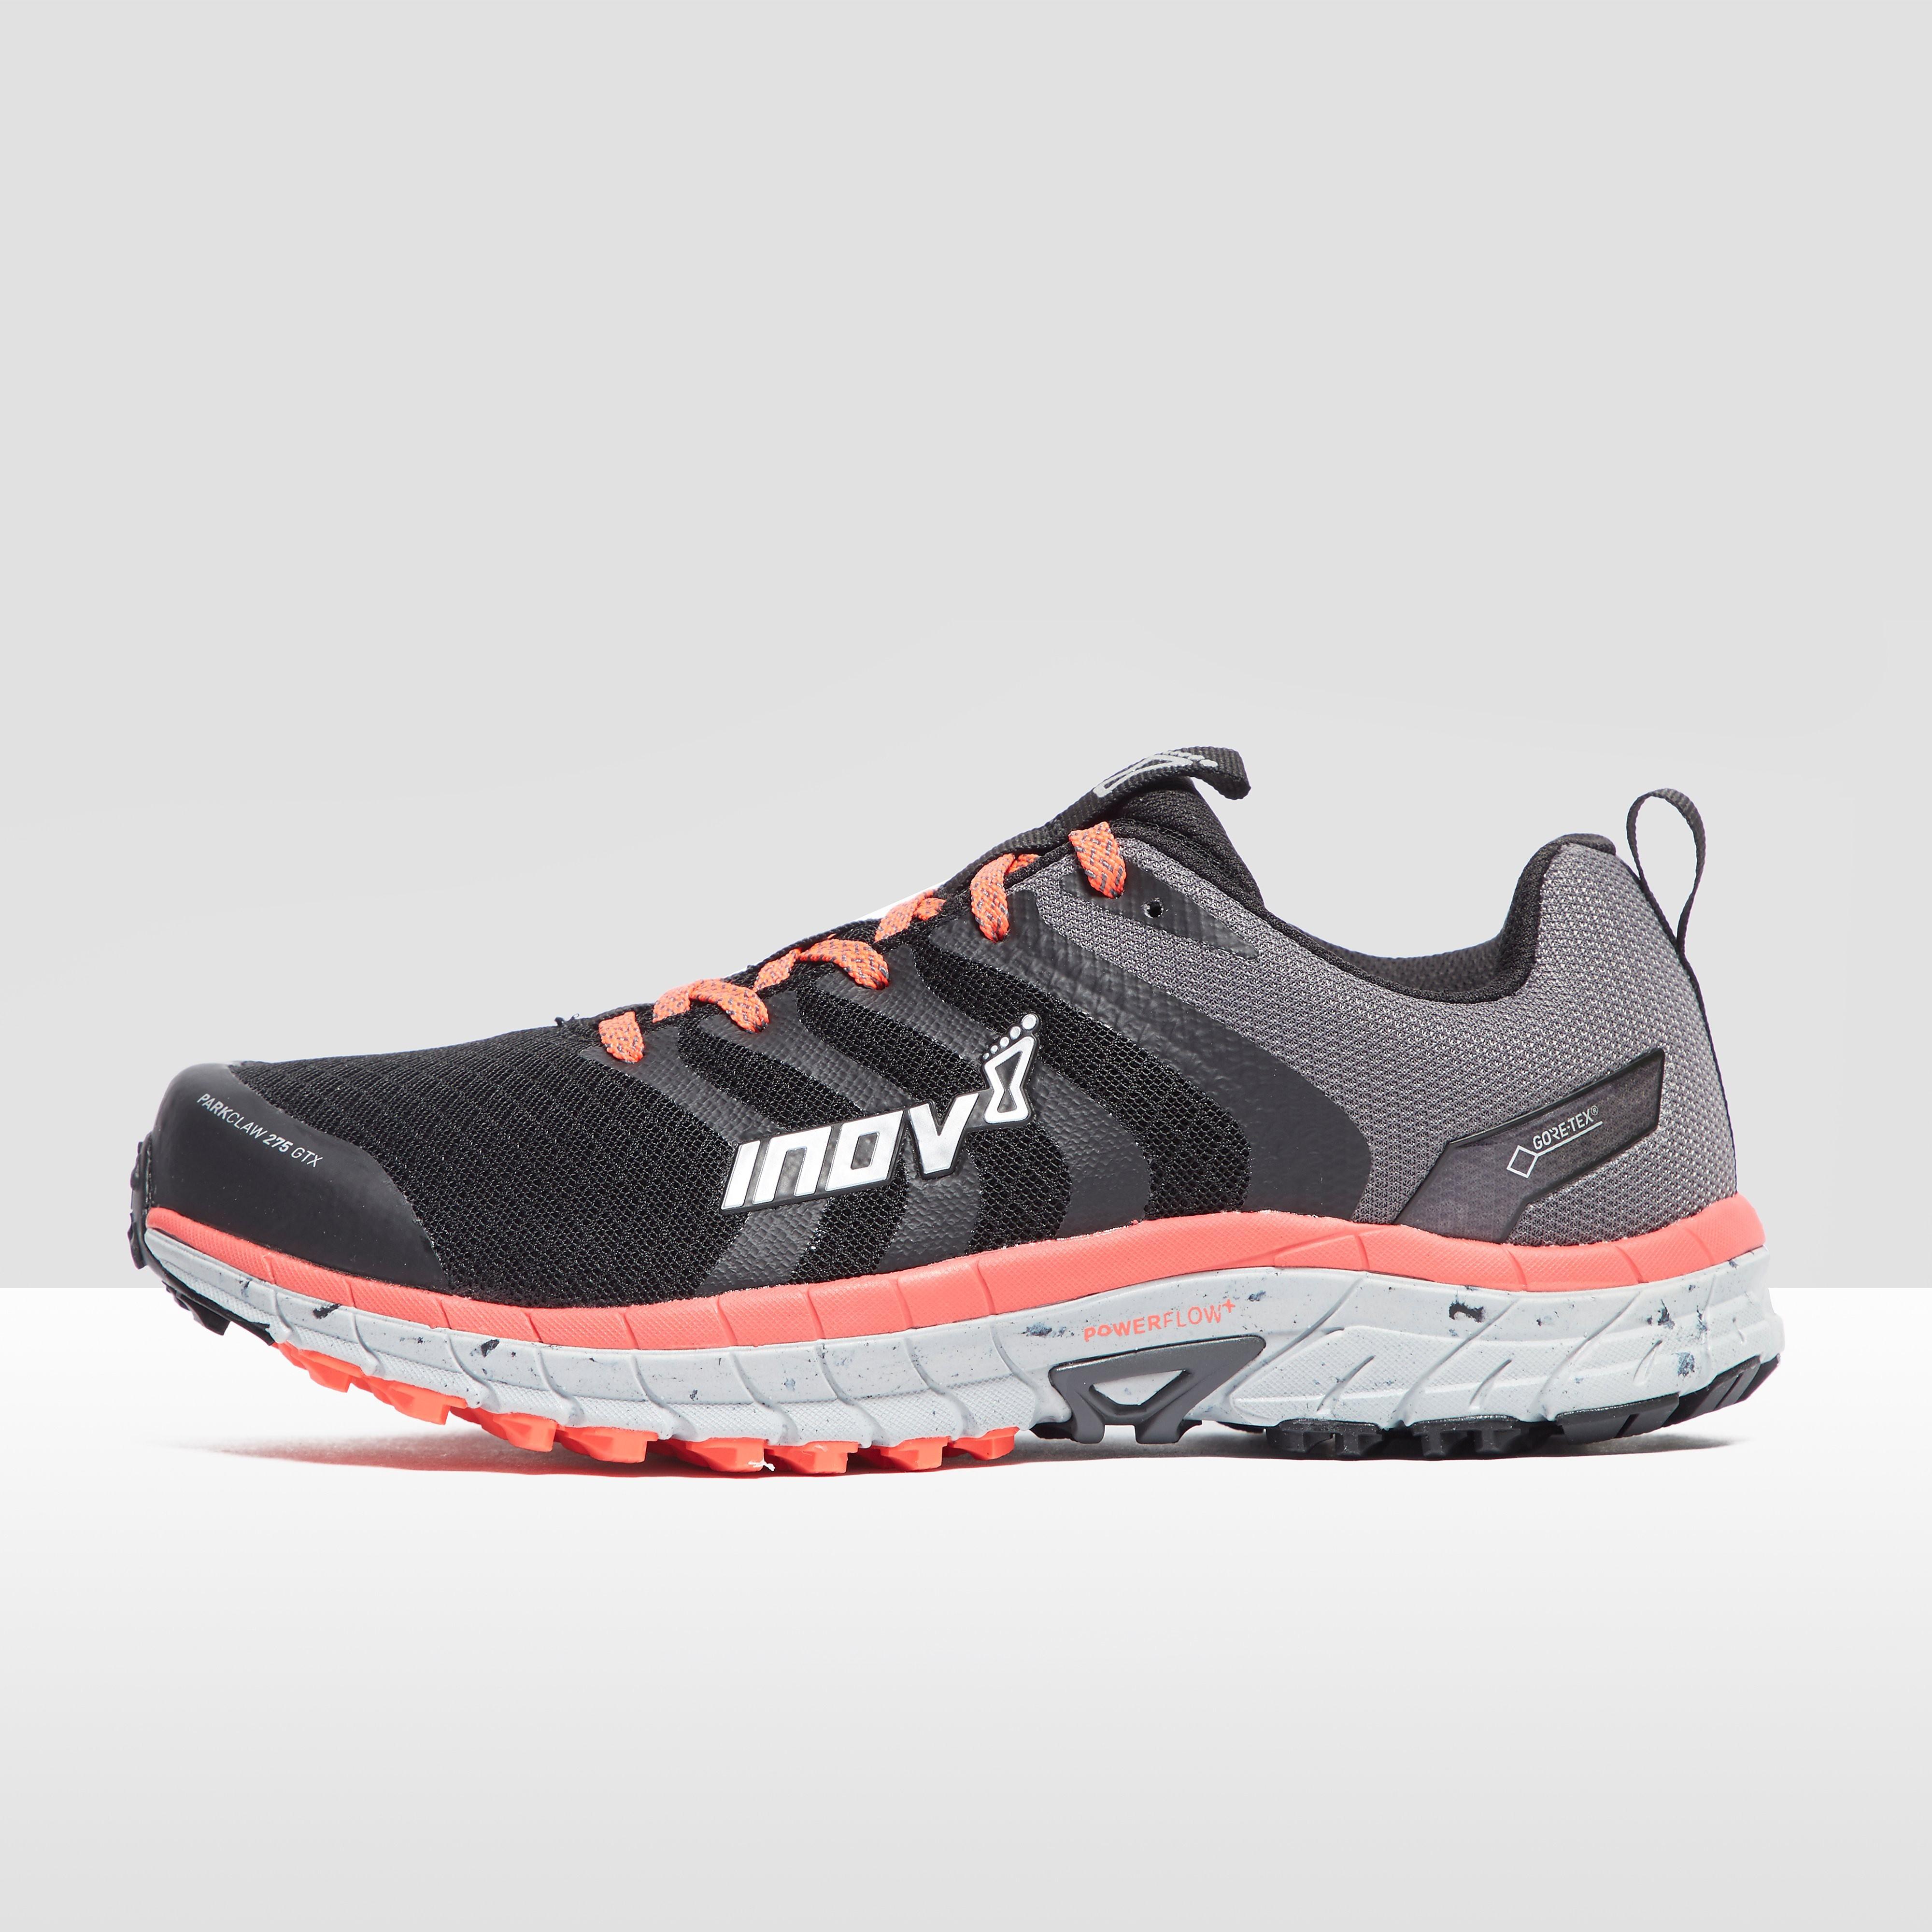 Inov-8 Parkclaw 275 GTX Women's Running Shoes